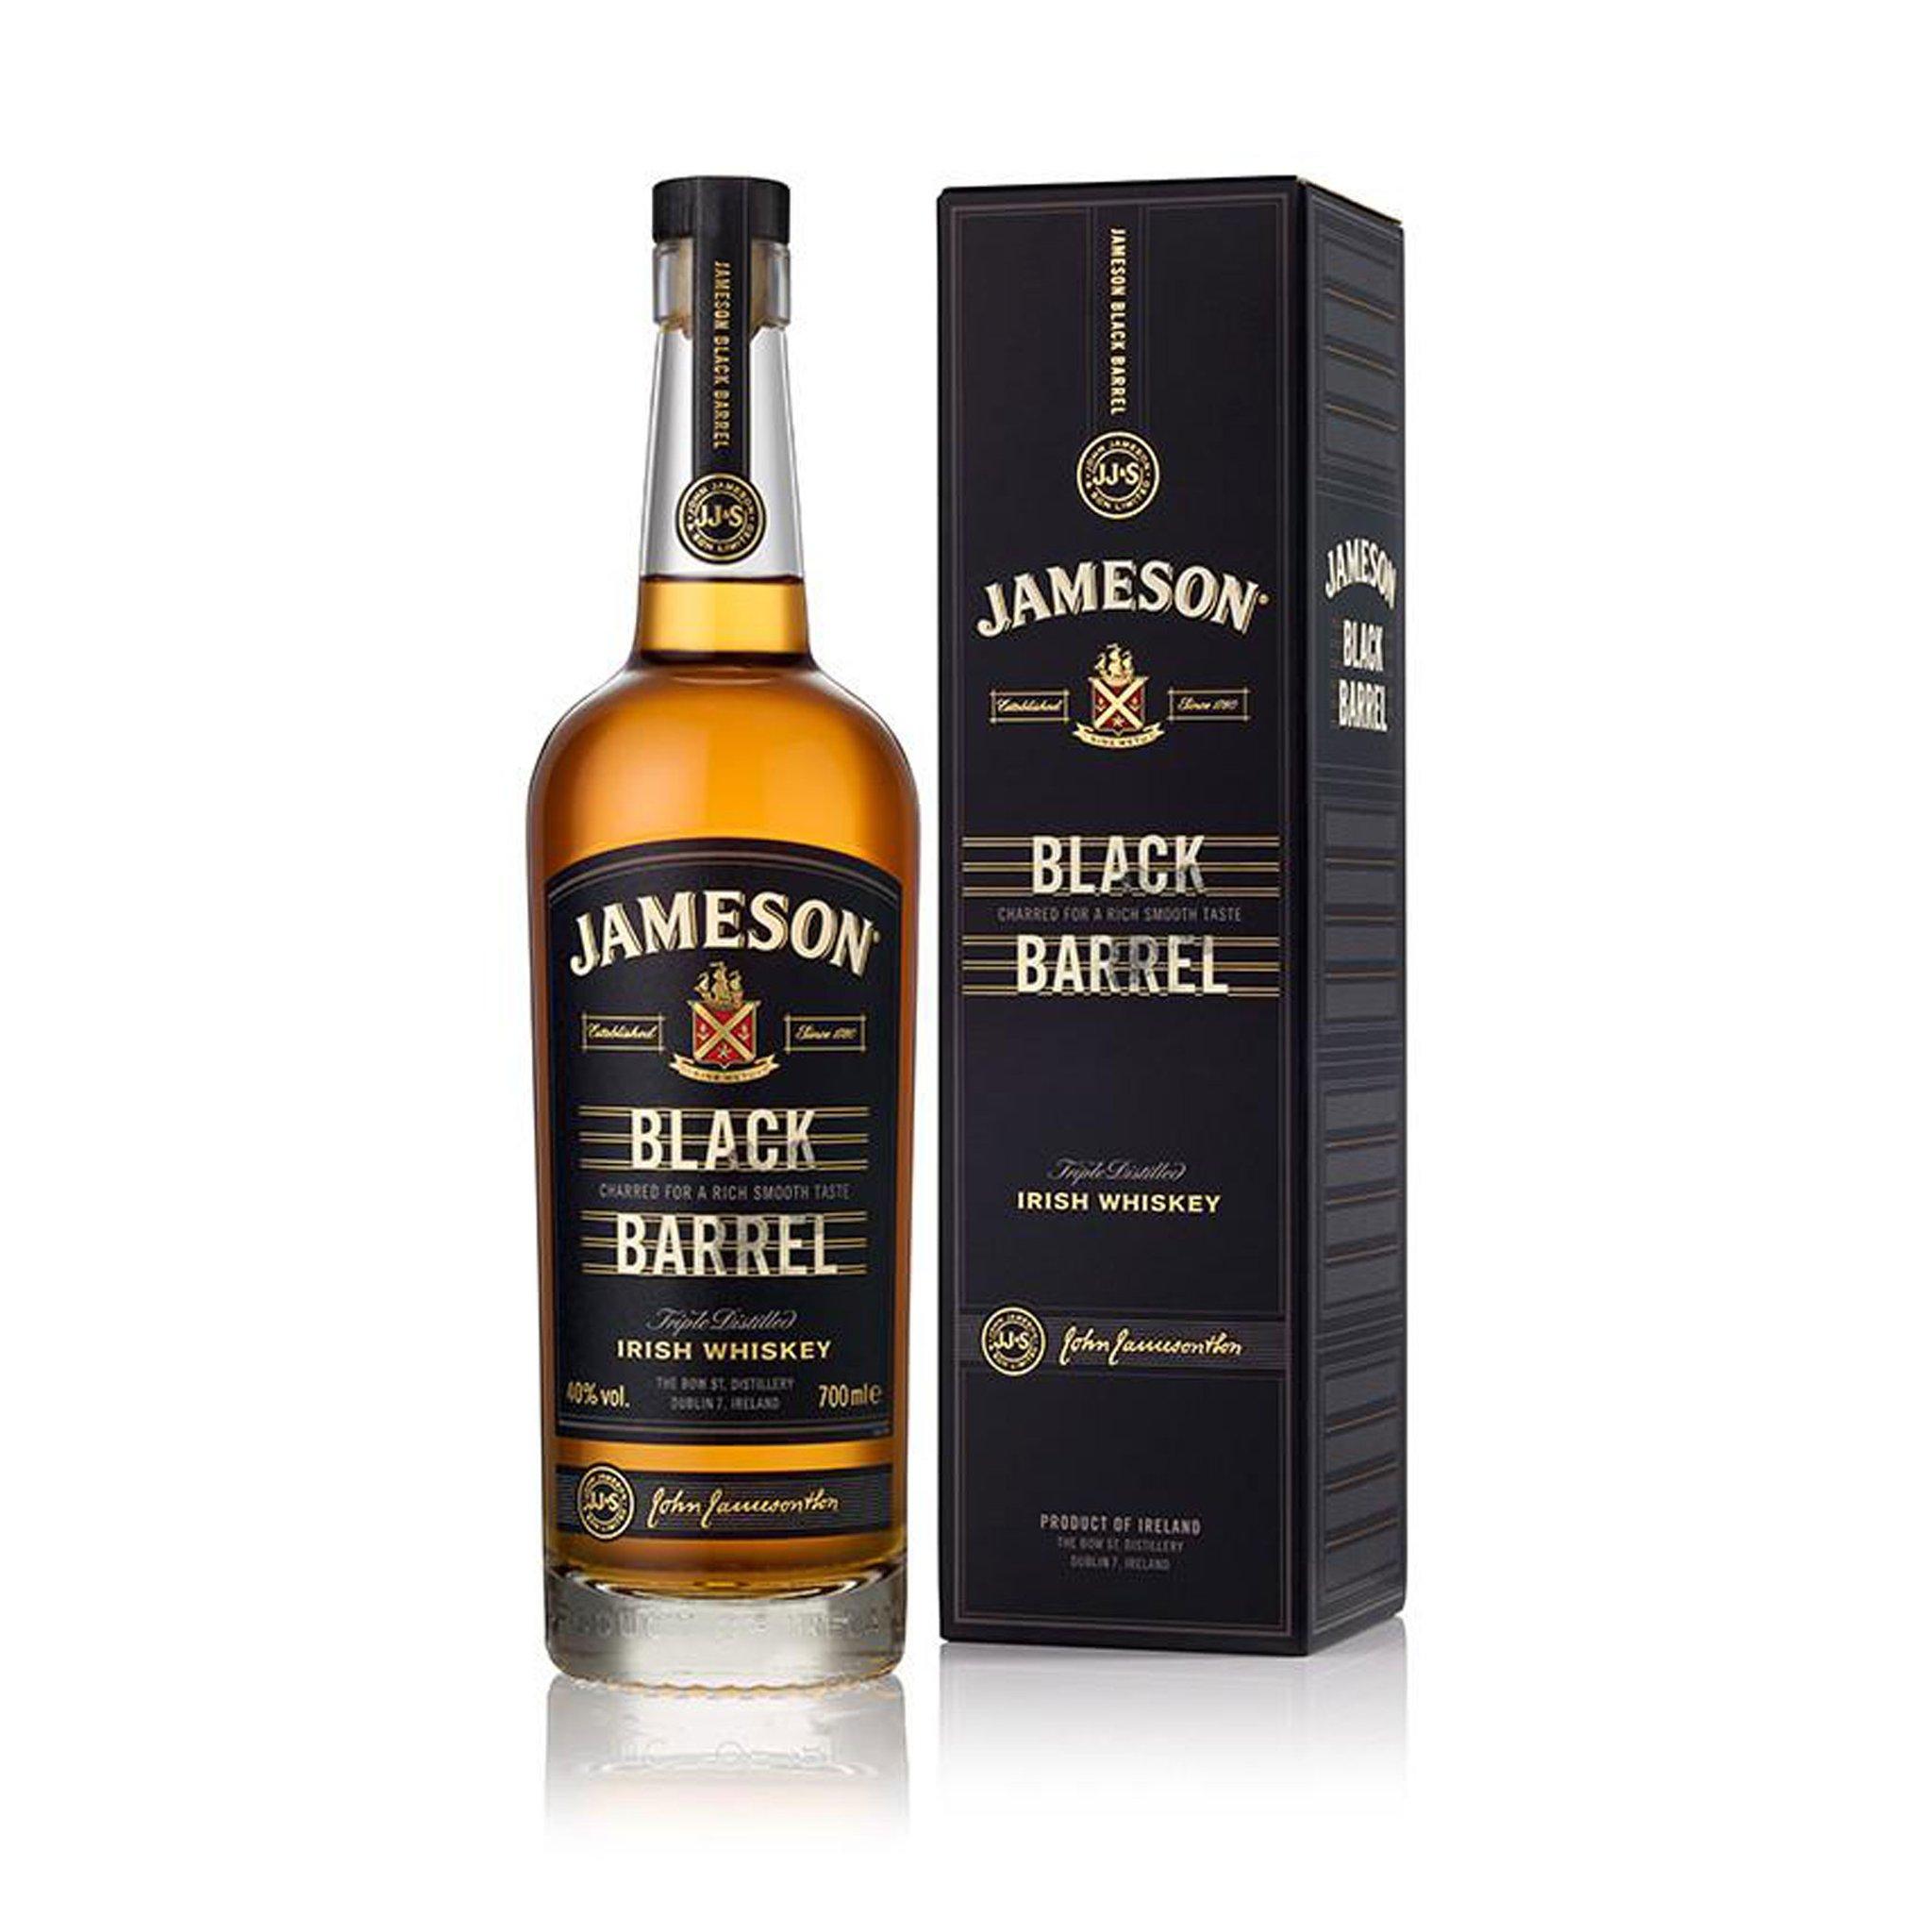 Jameson Black Barrel Triple Distilled Irish Whiskey 700ML